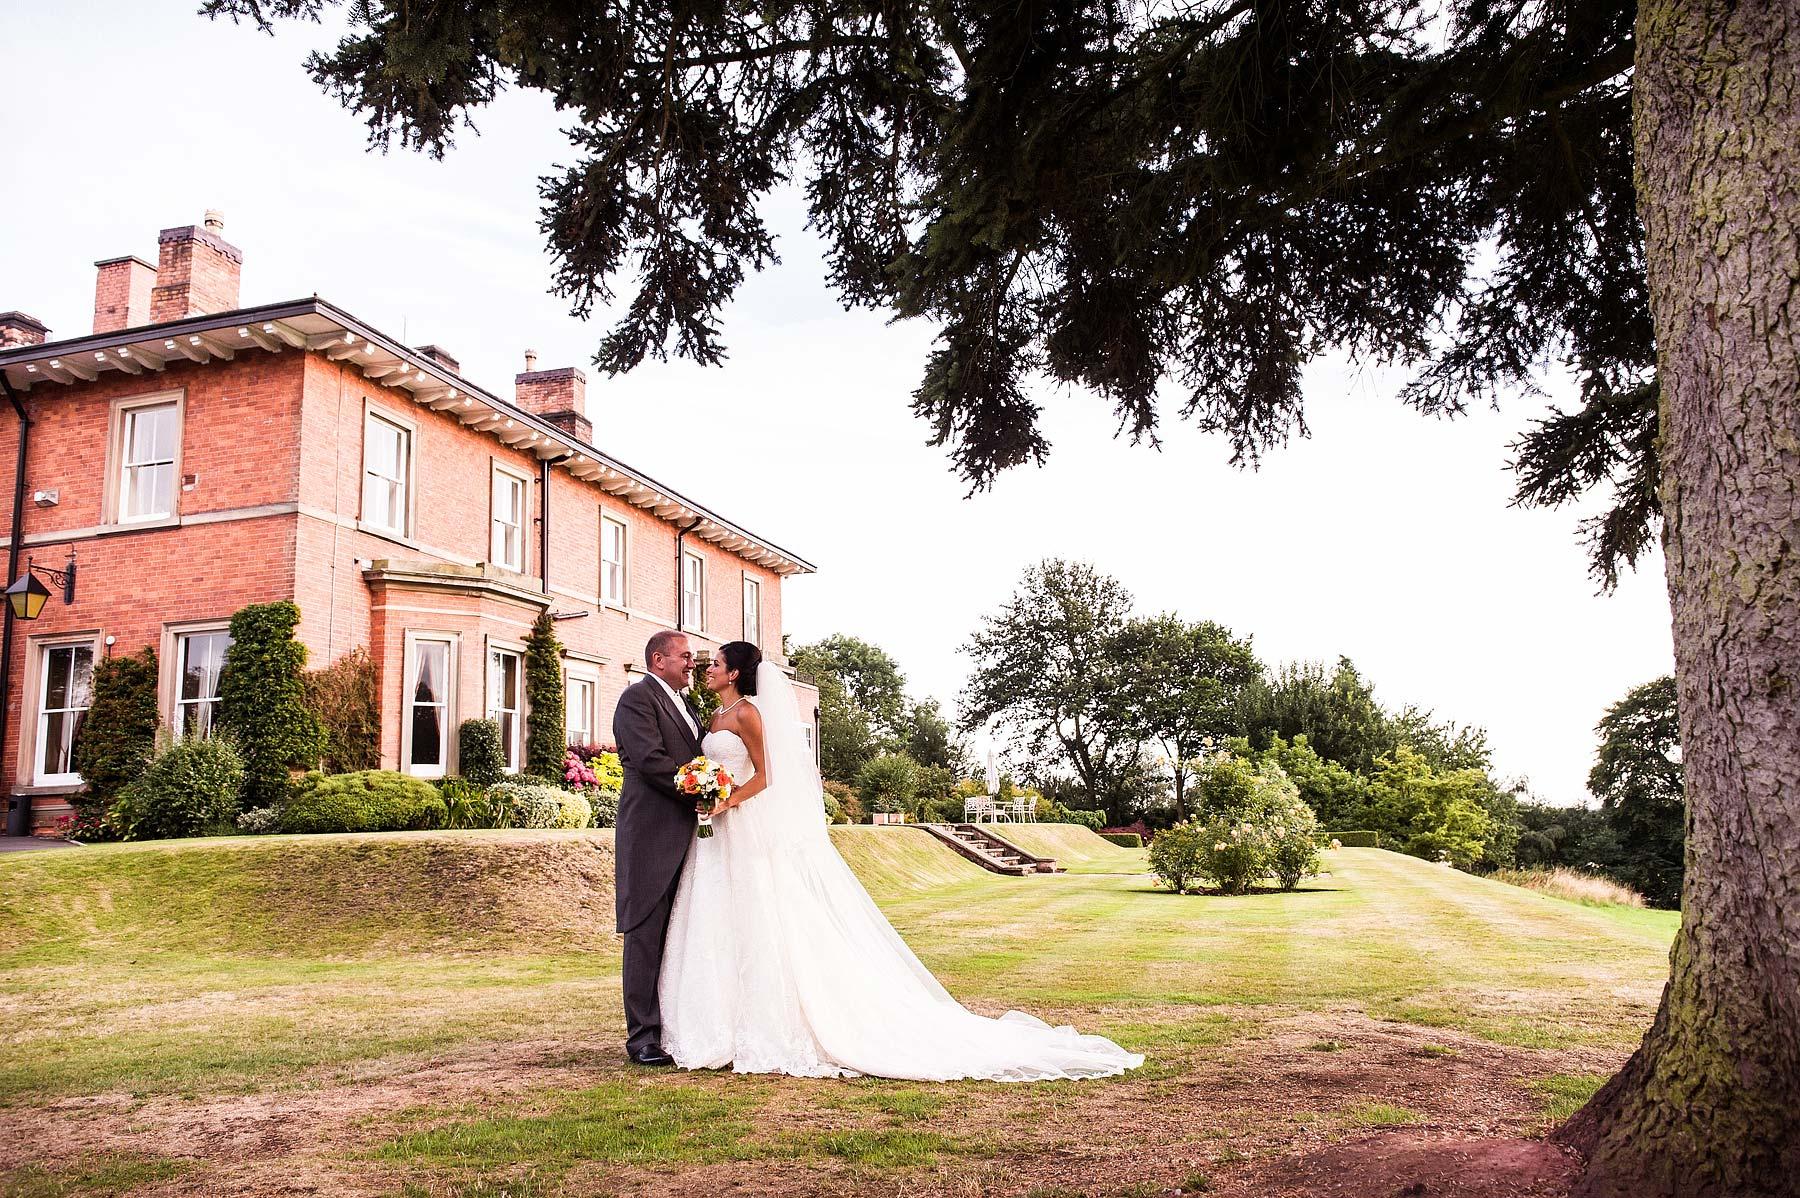 upper-house-barlaston-stone-wedding-photographers-047